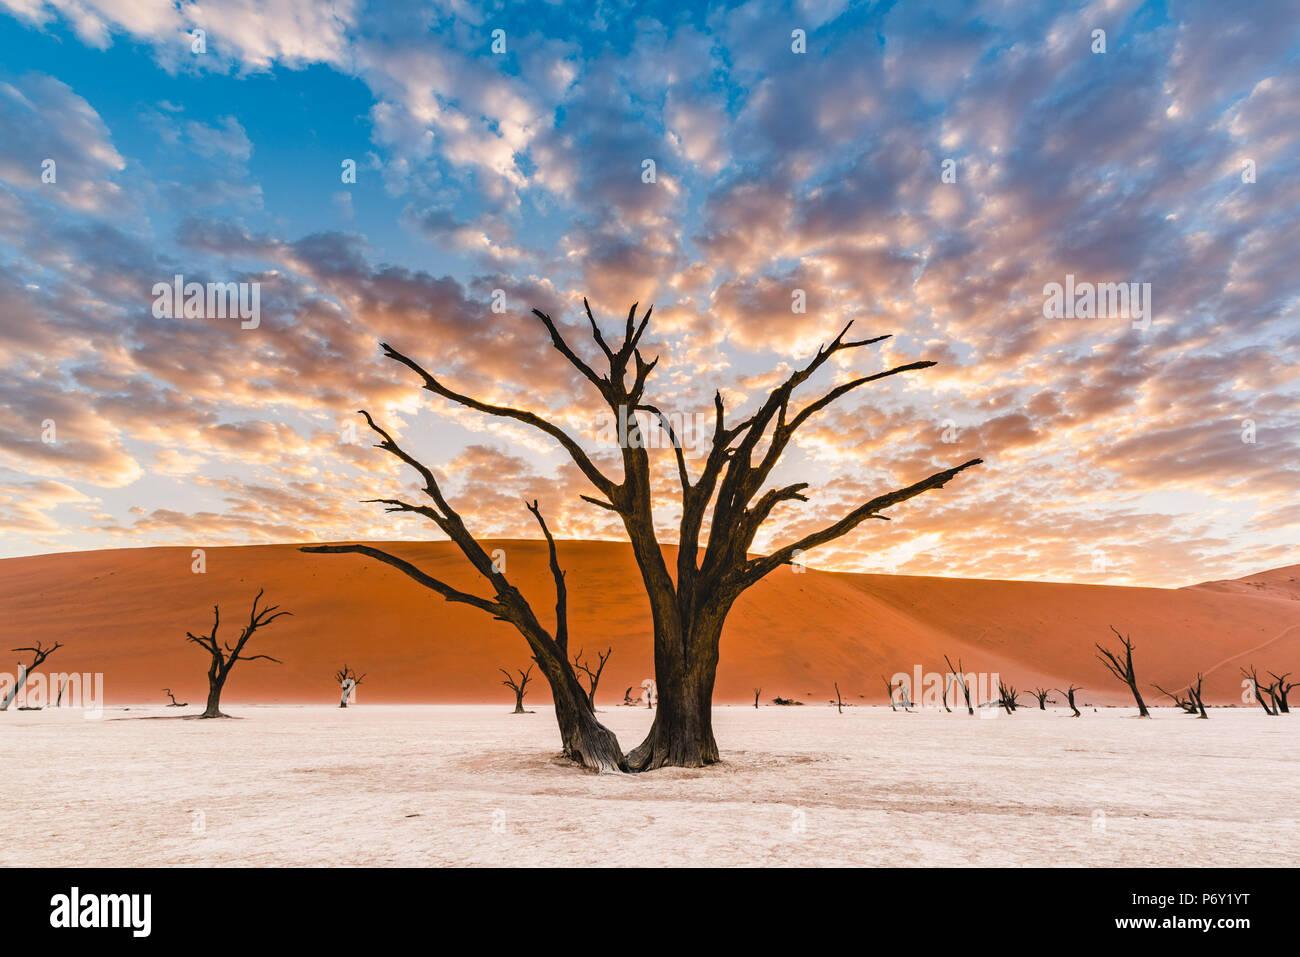 Deadvlei clay pan, Namib-Naukluft National Park, Namibia, Africa. Morto di alberi di acacia e dune di sabbia. Immagini Stock